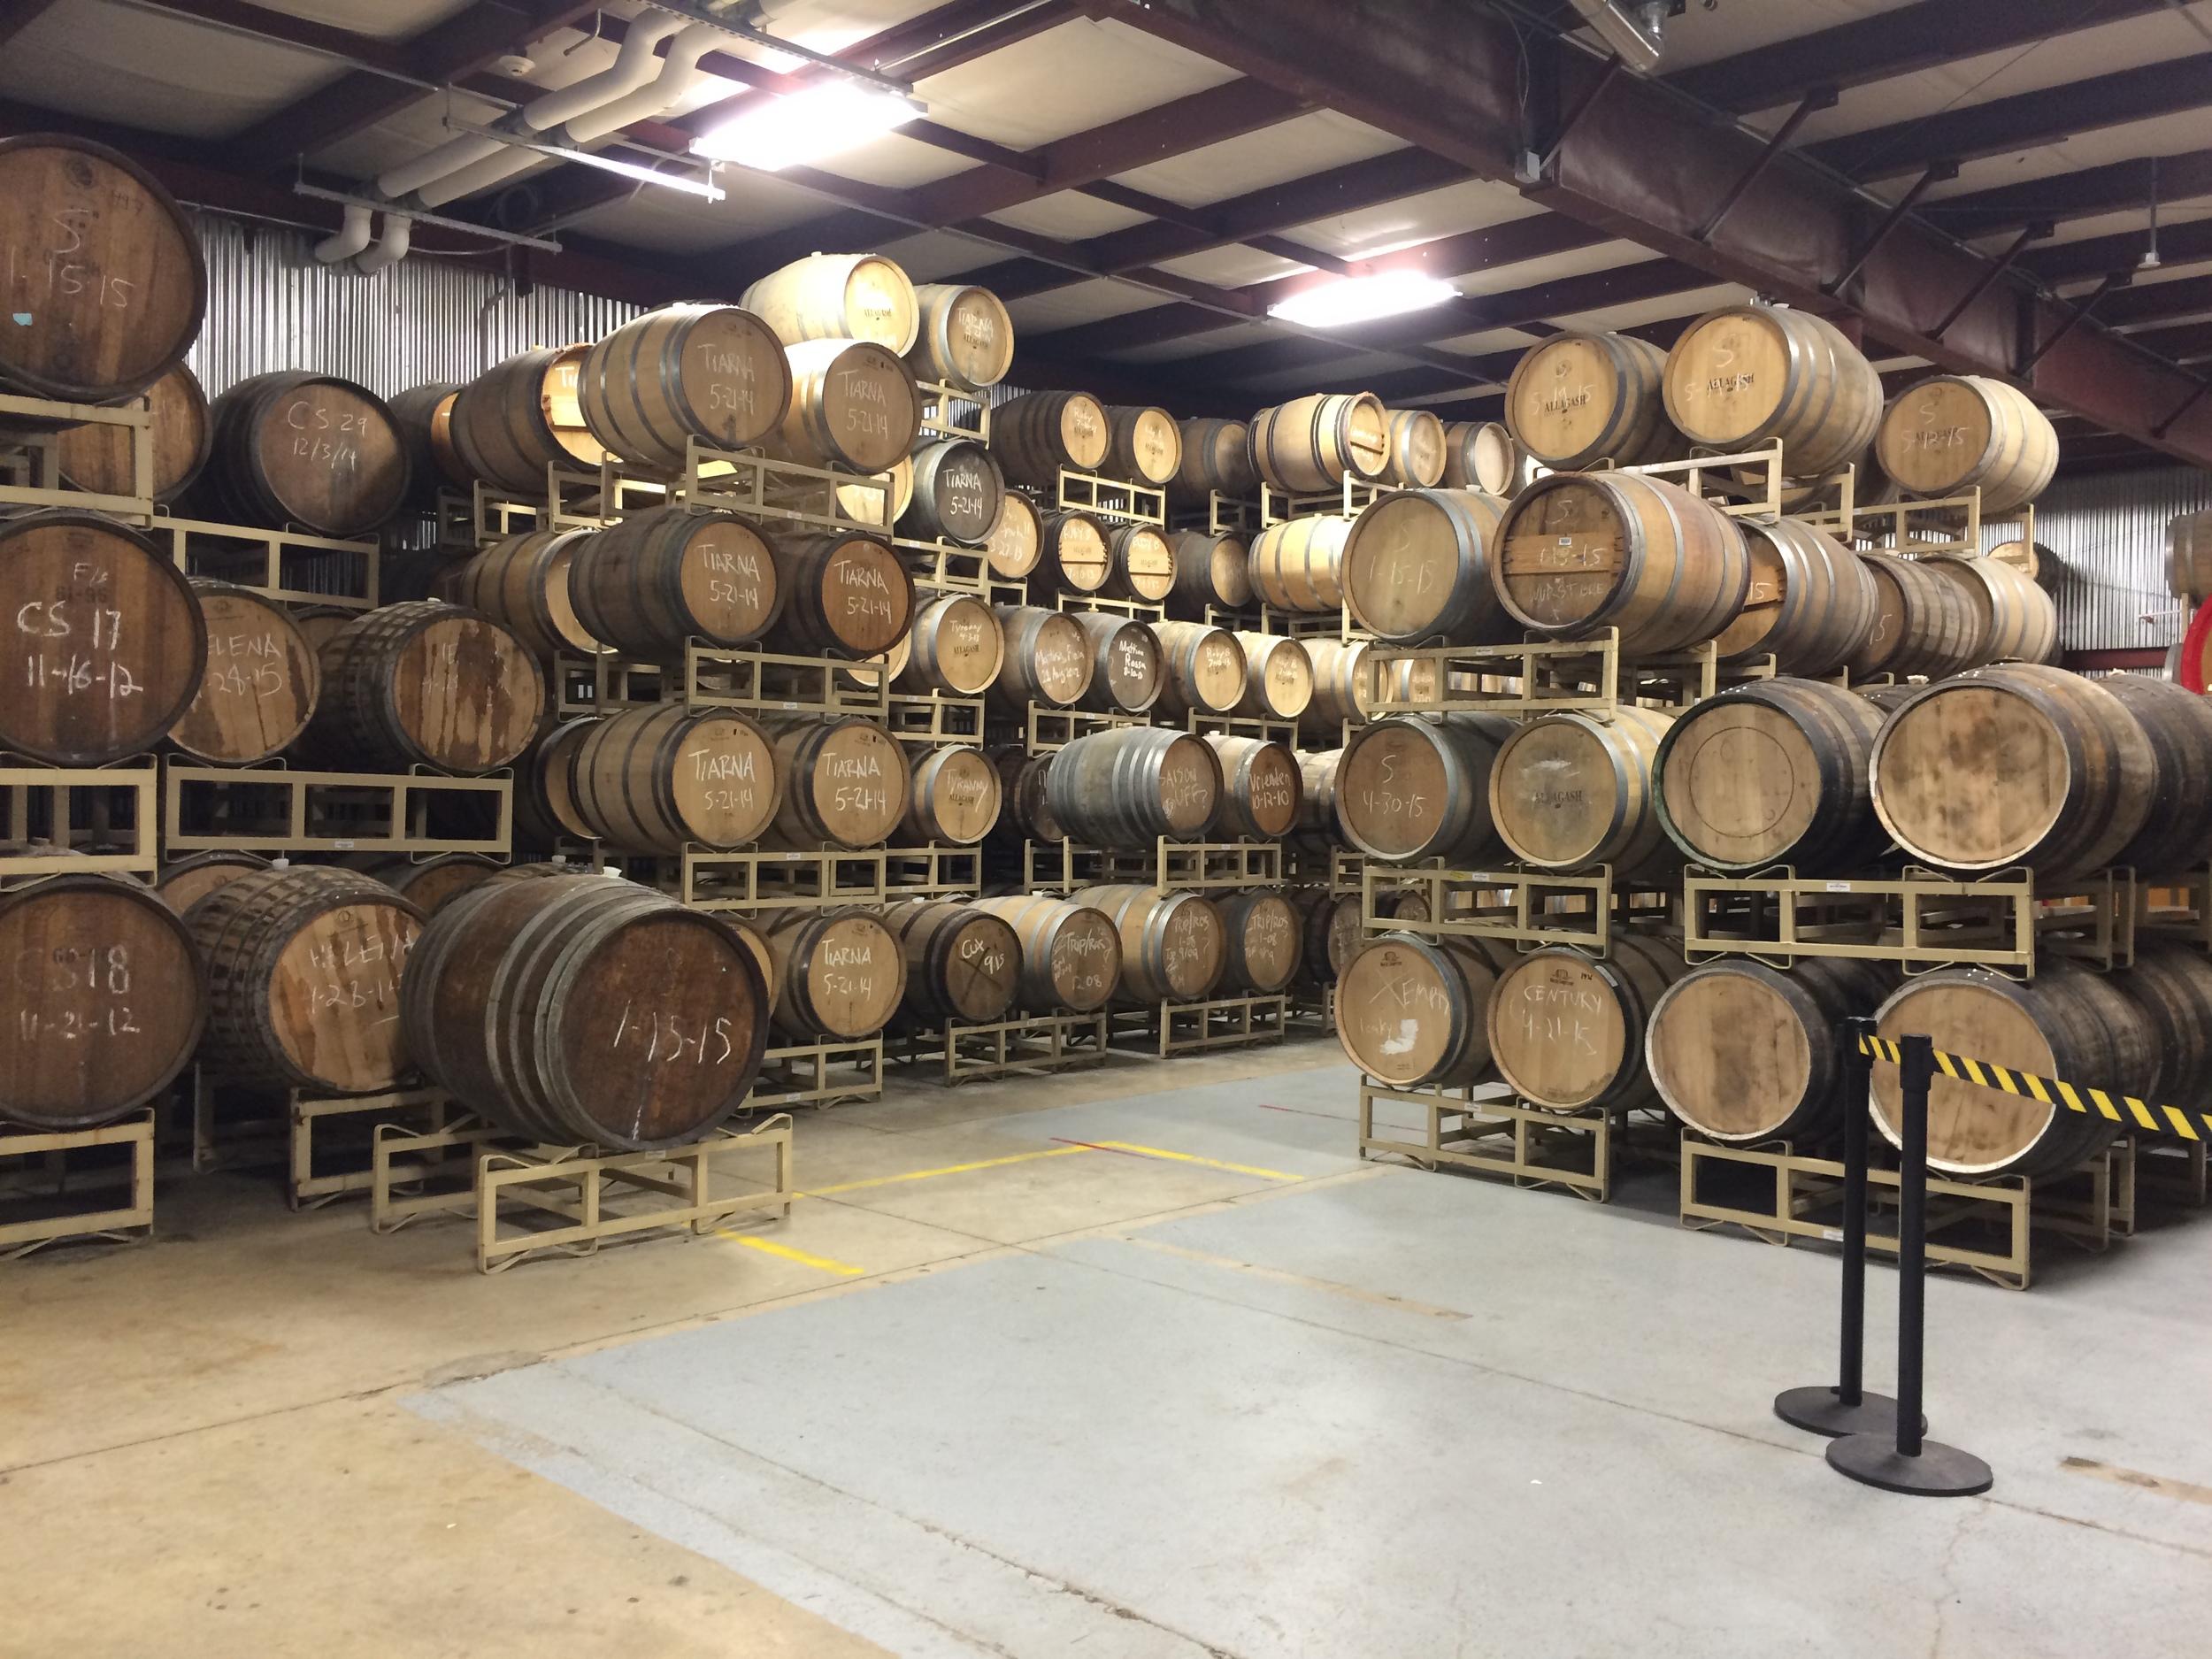 Inside Allagash's barrel agingcellar